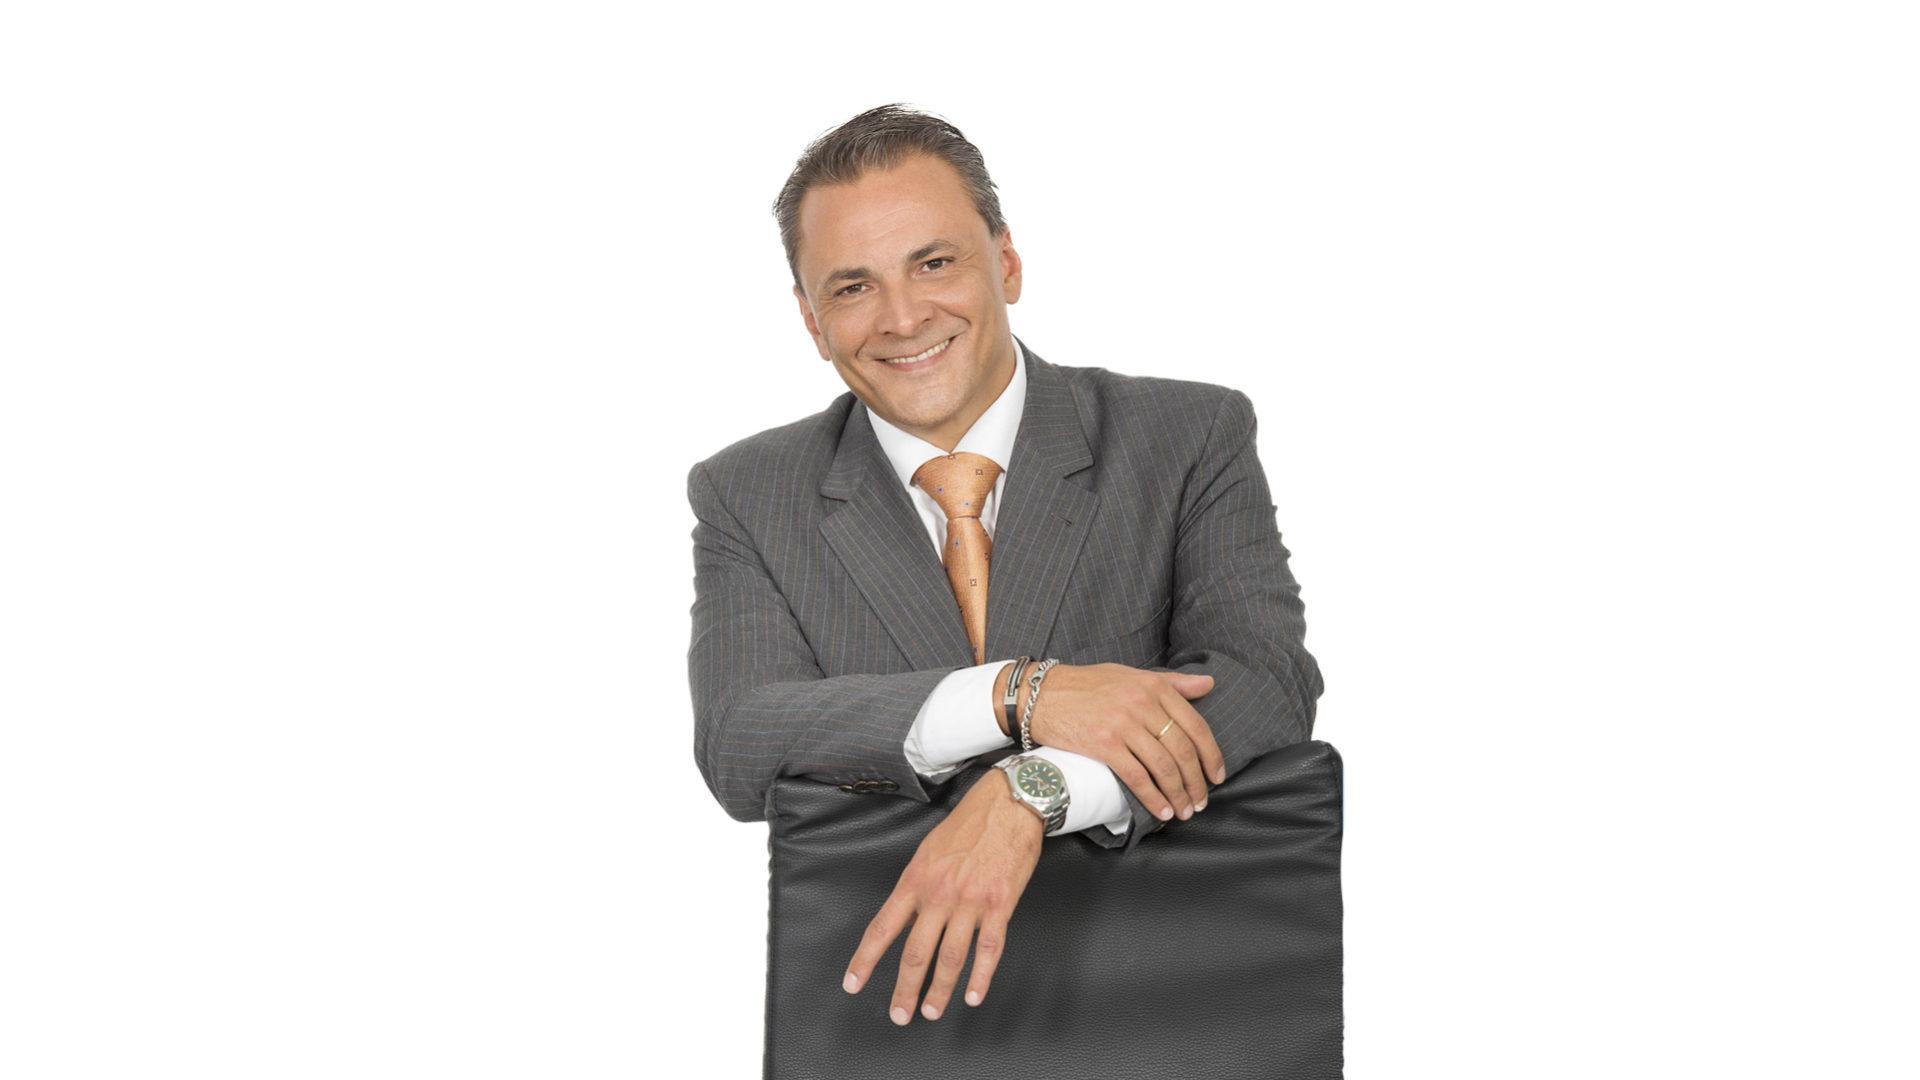 foto Stefano Spera, Sales Director di R1 Group